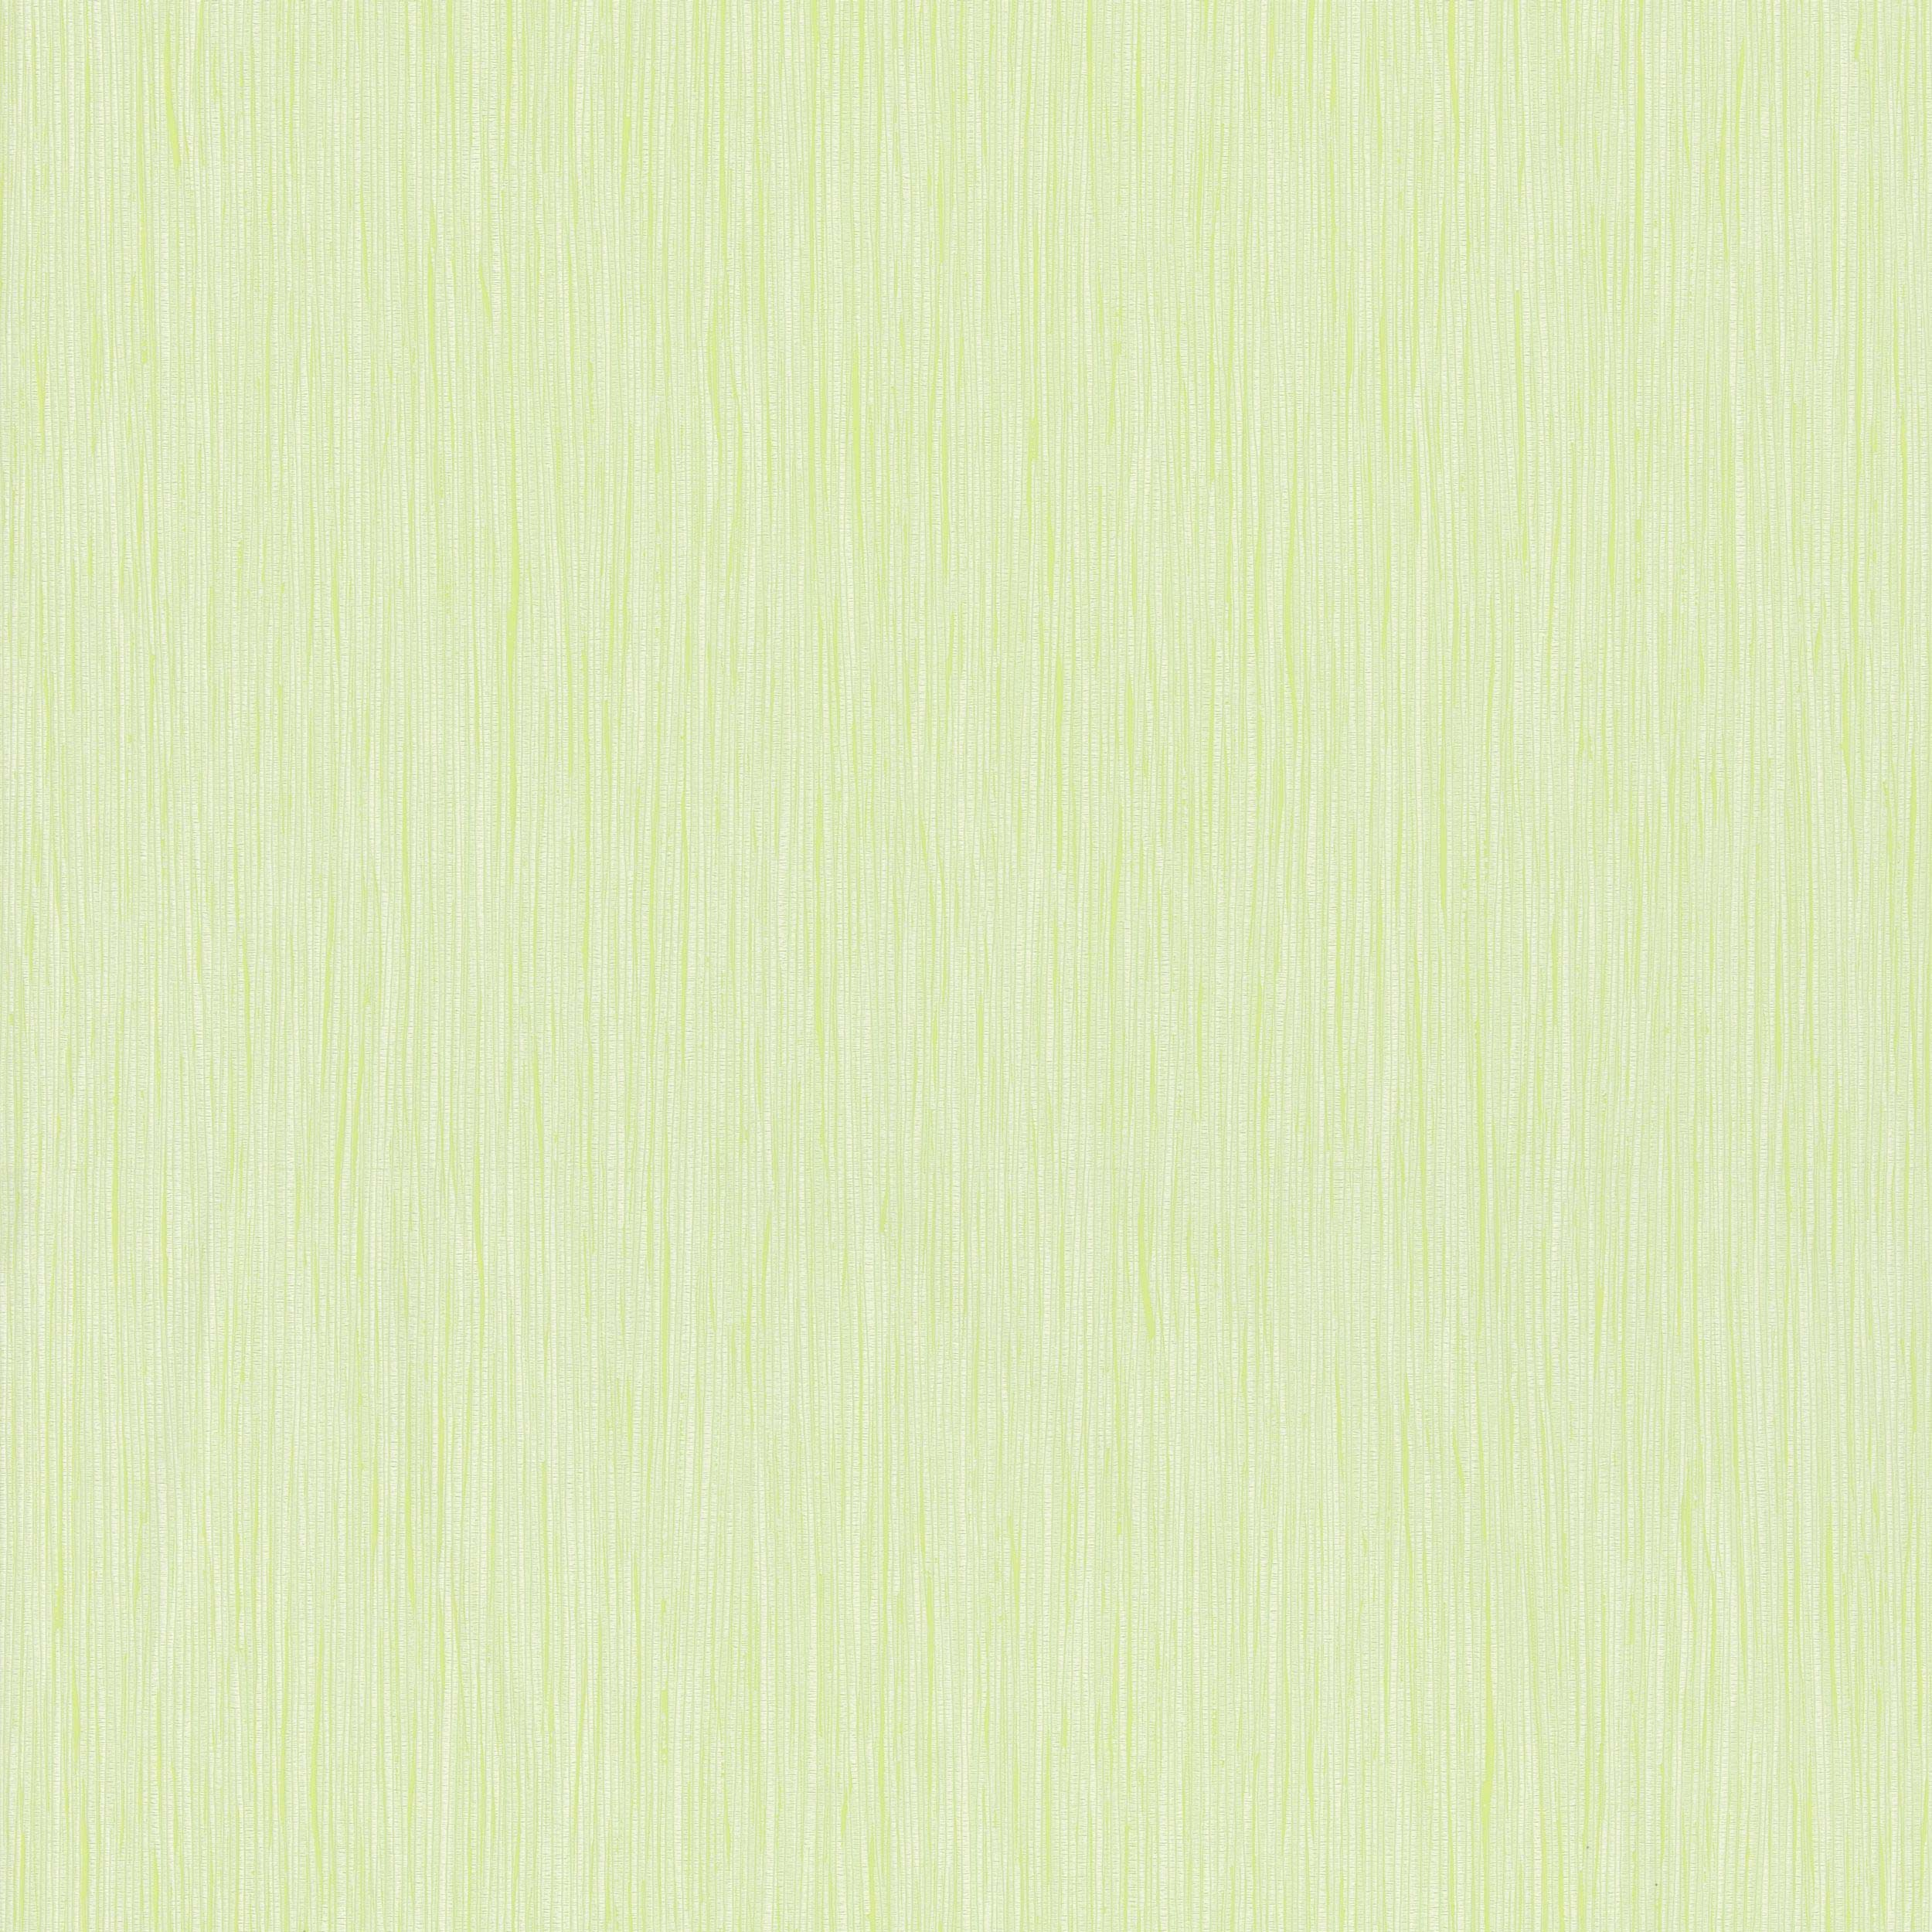 Binkele Farben, Lacke & Tapeten Onlinehandel - Marburg KUNTERBUNT 56527